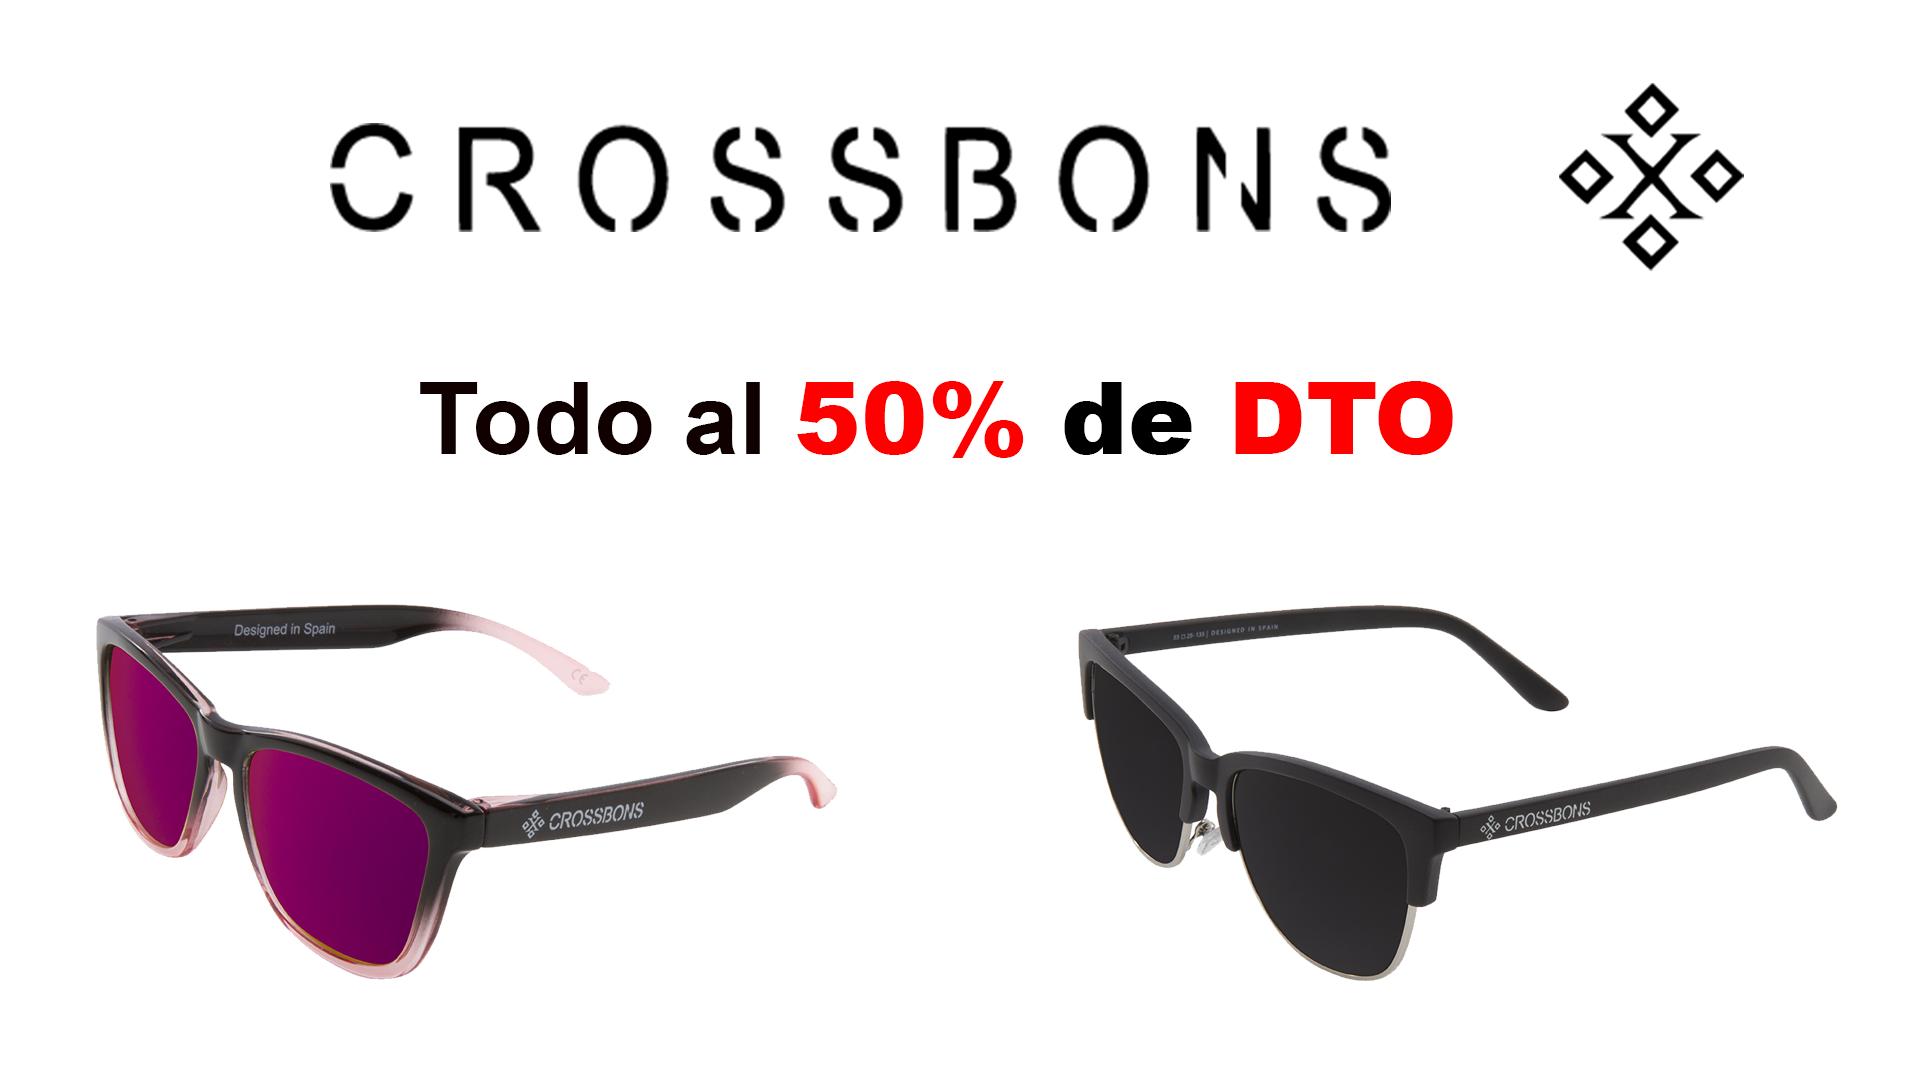 Crossbons 50%